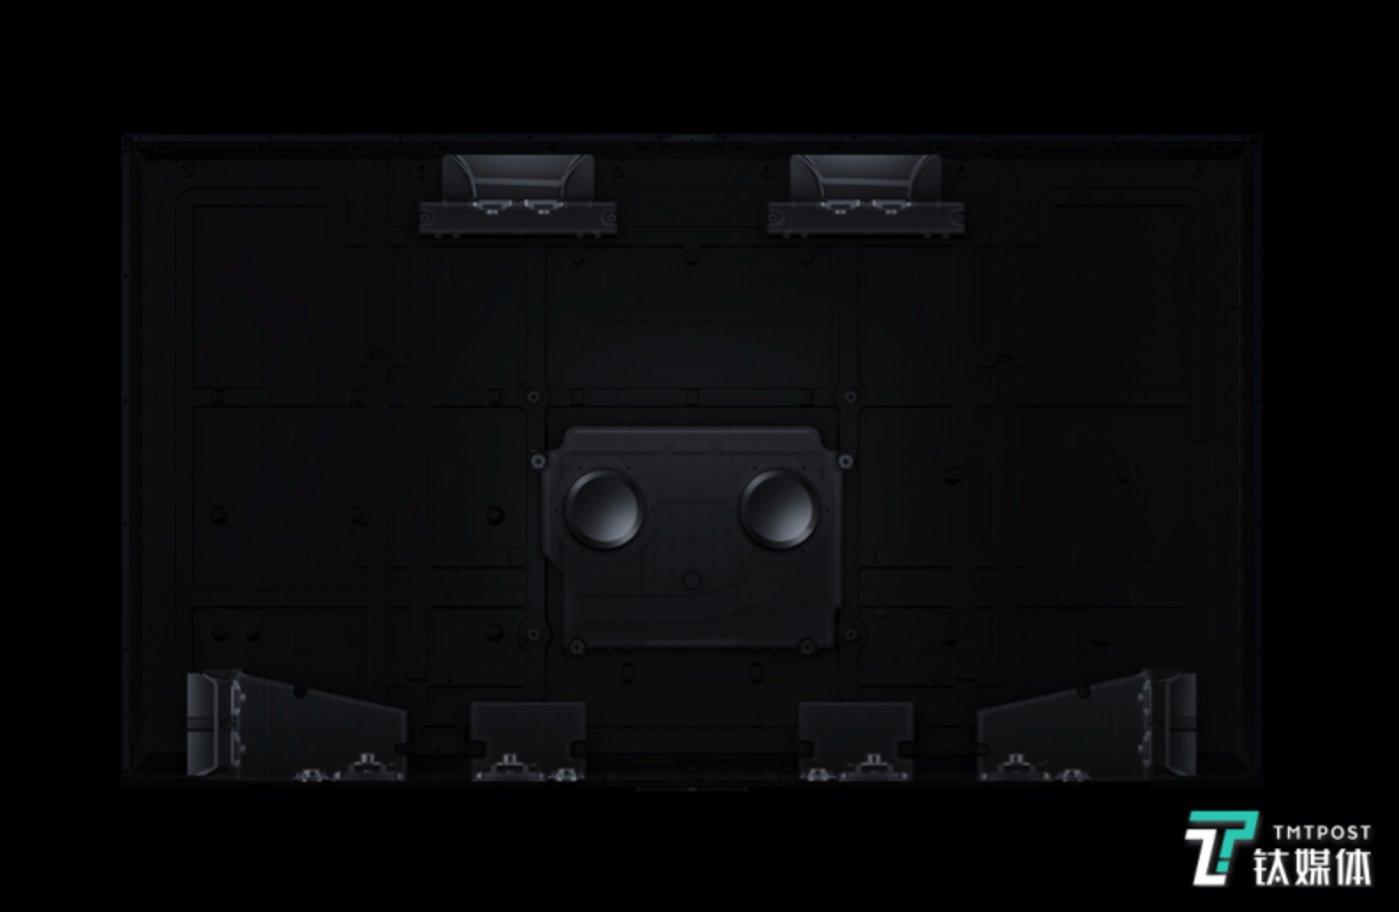 OPPO智能电视S1内置多达18个扬声器单元